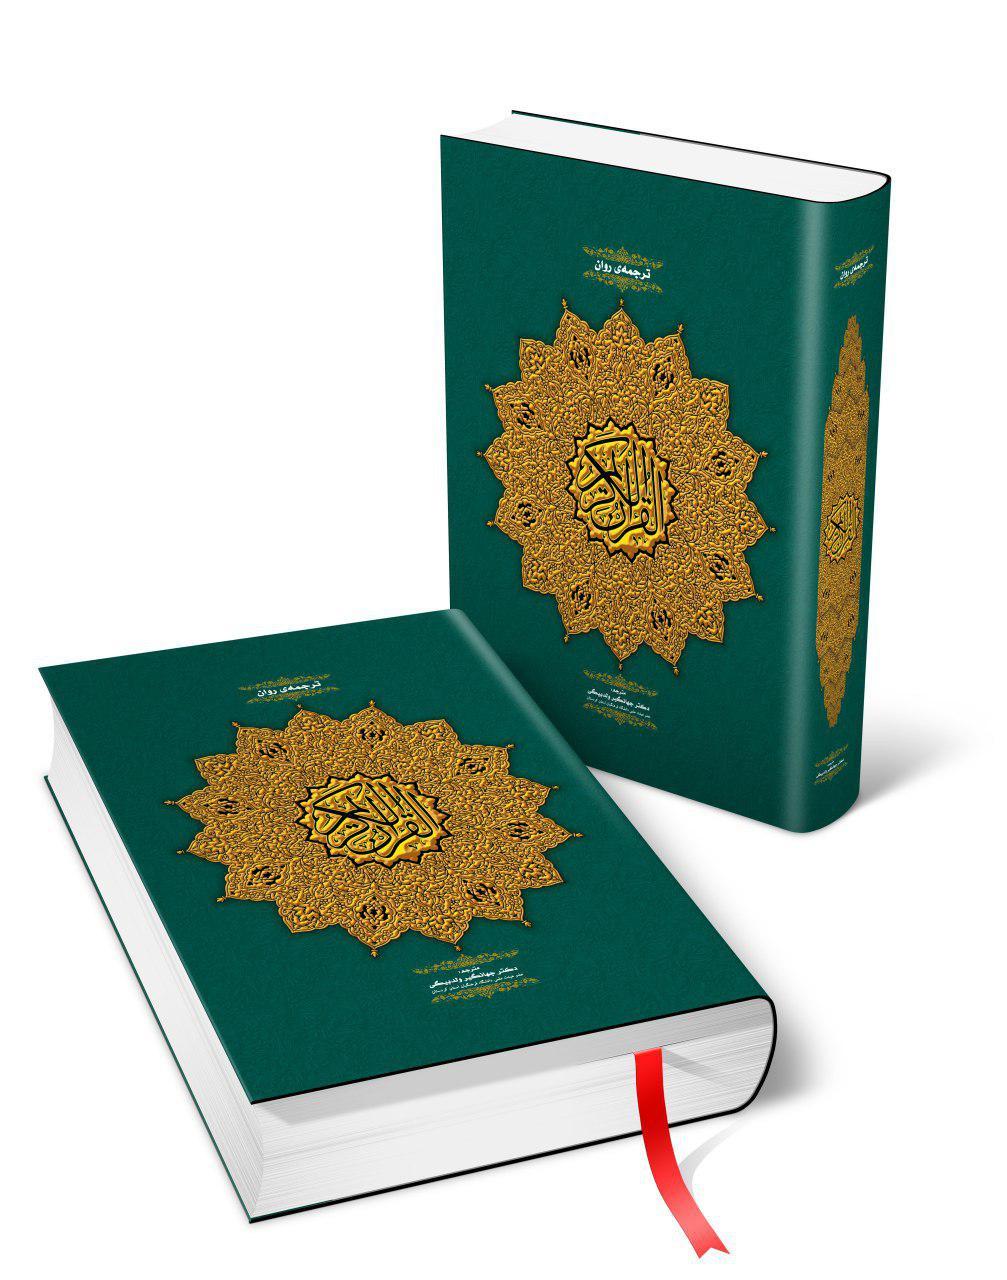 Photo of ترجمه روان قرآن کریم به زبان فارسی، به شکل زیرنویس آیات